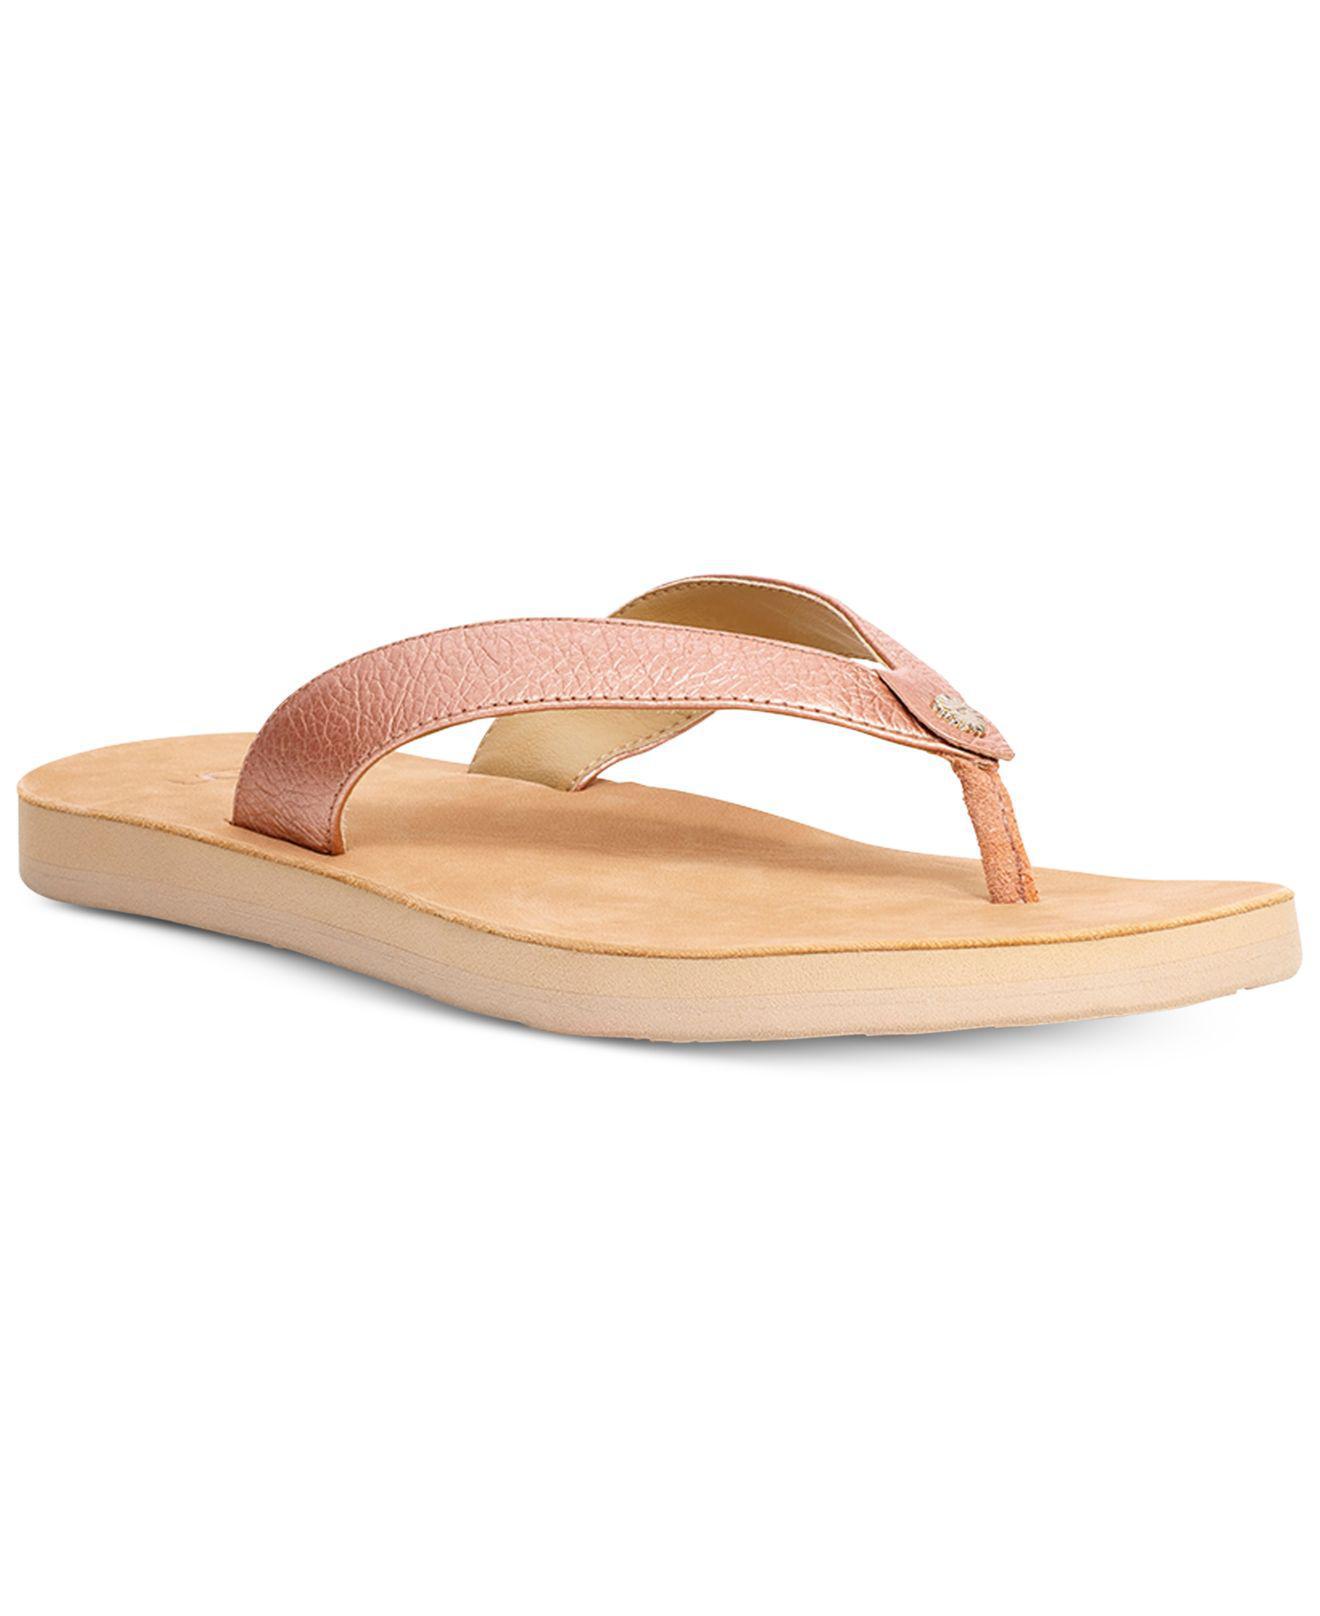 4adfdfaad75c21 Lyst - UGG Tawney Flip-flop Sandals in Pink